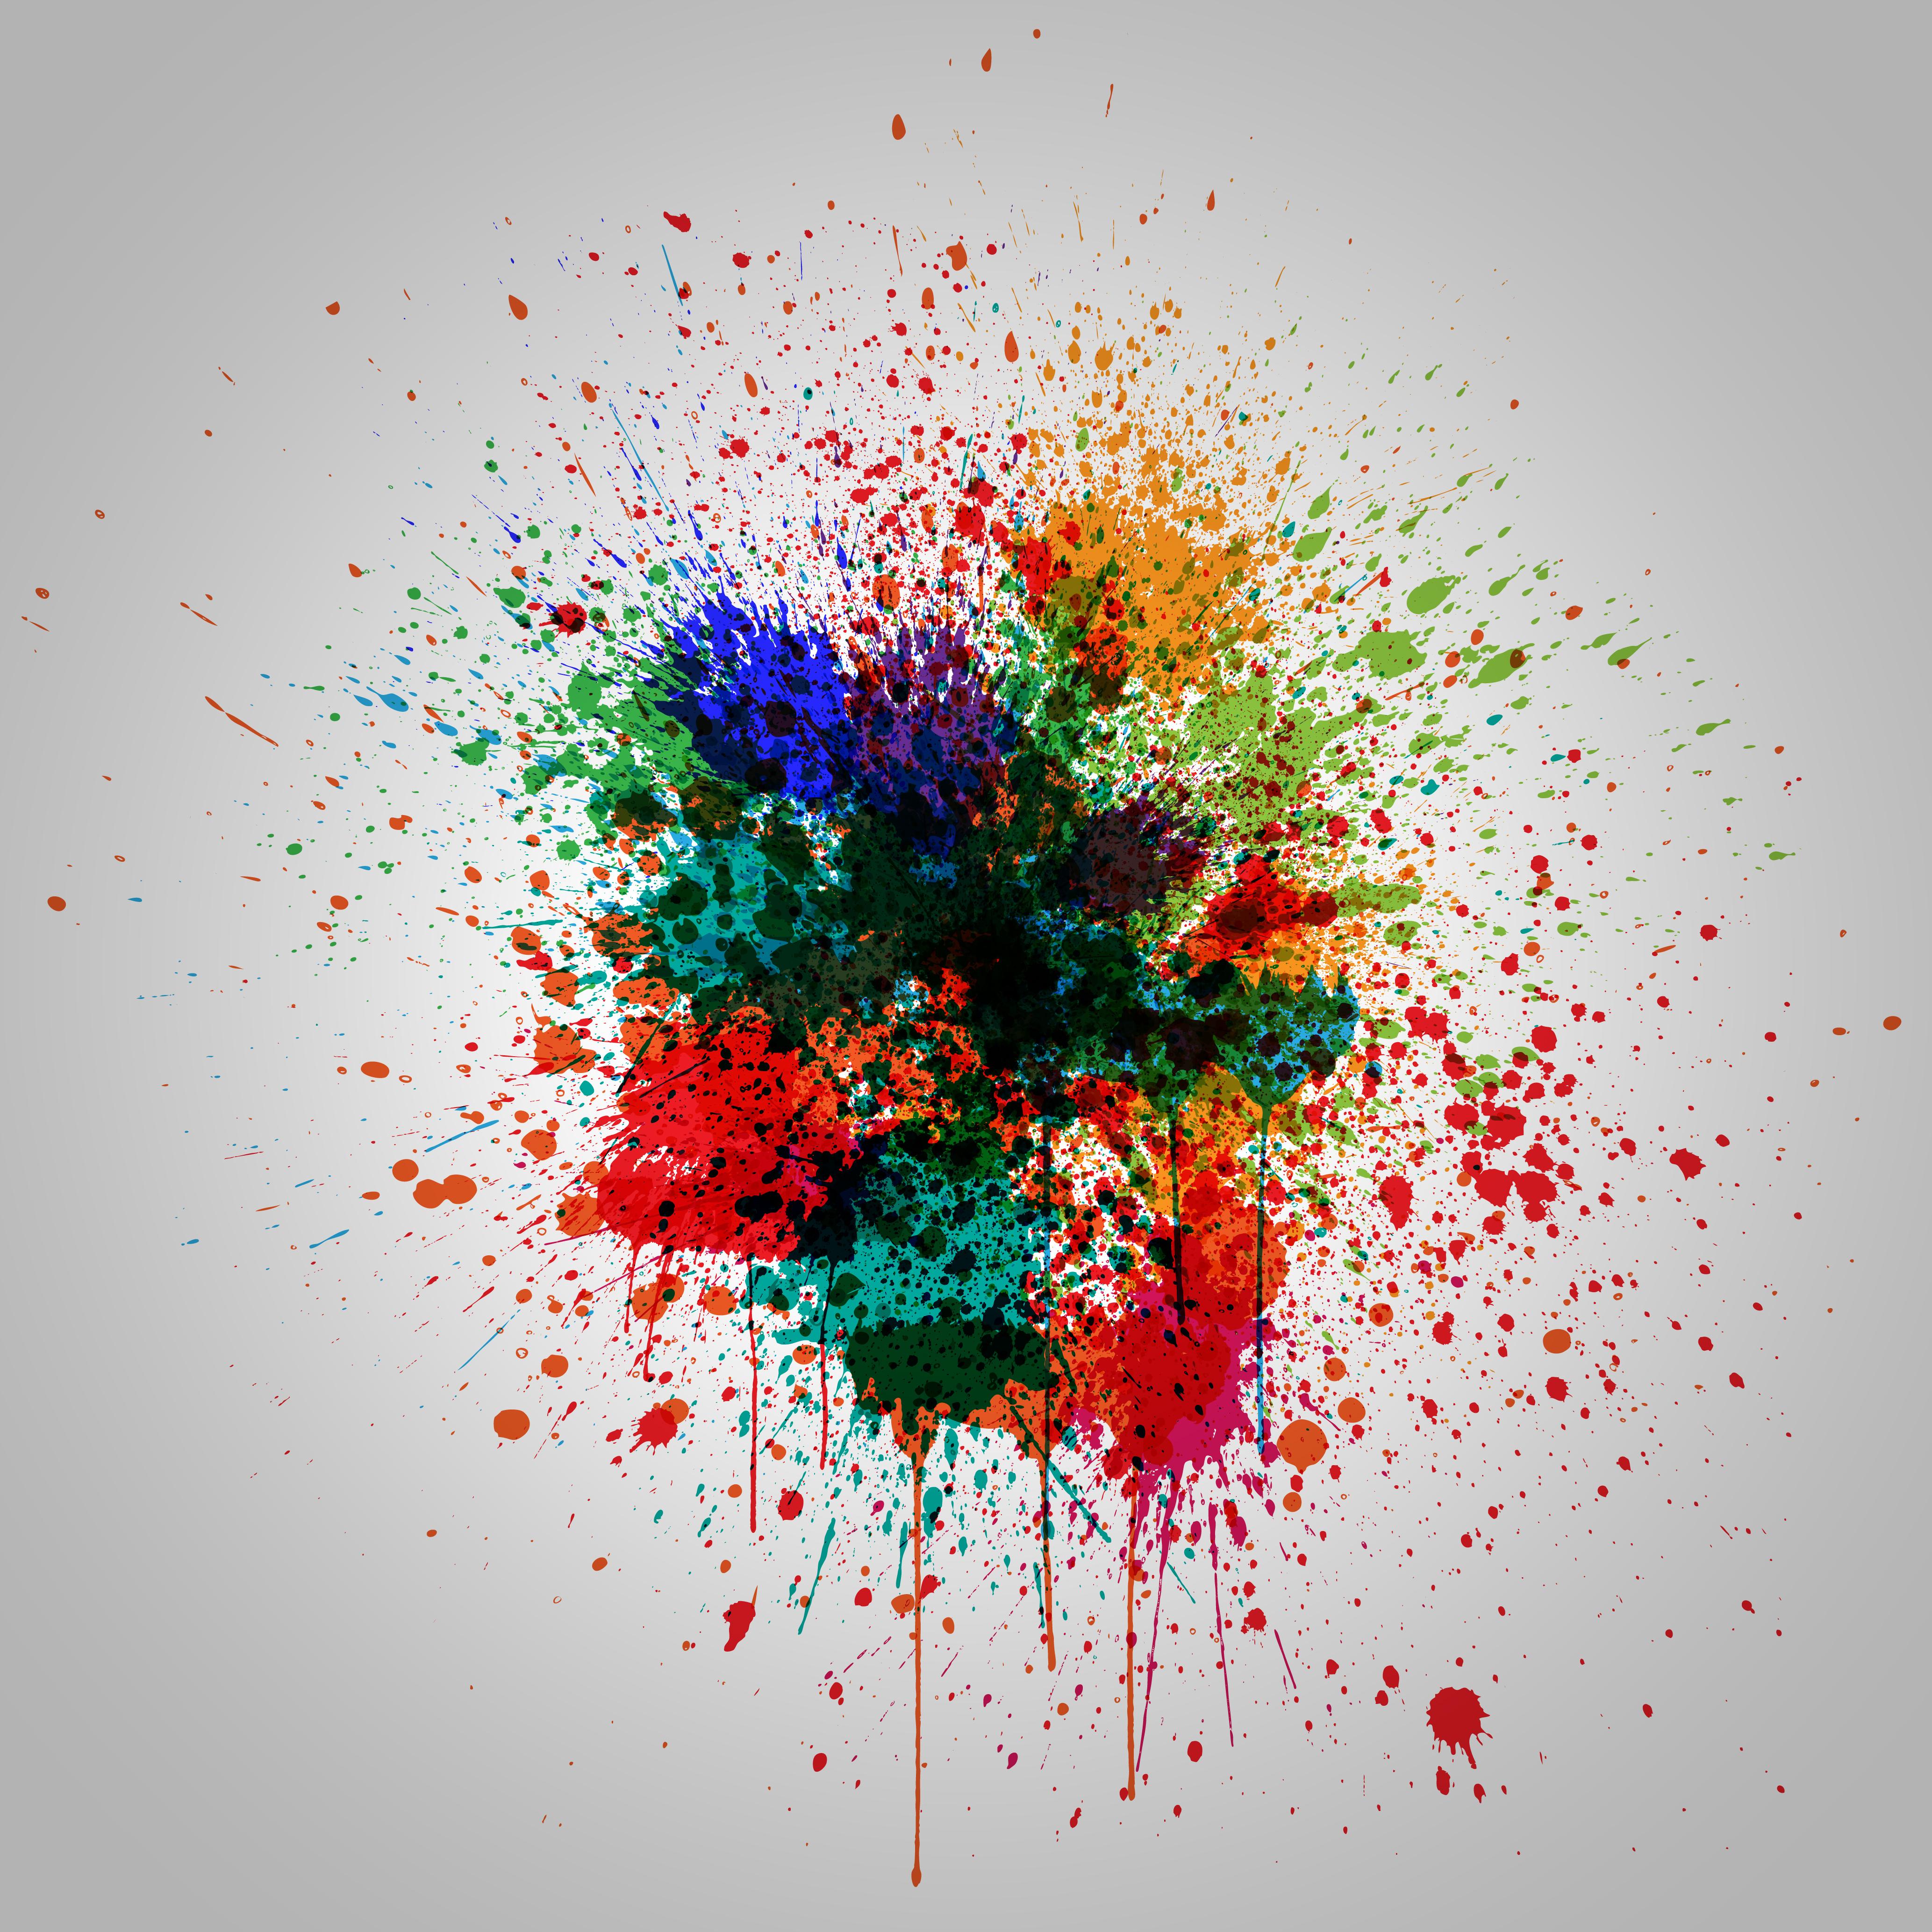 Colorful Splash Effect Vector Illustration Download Free Vectors Clipart Graphics Vector Art